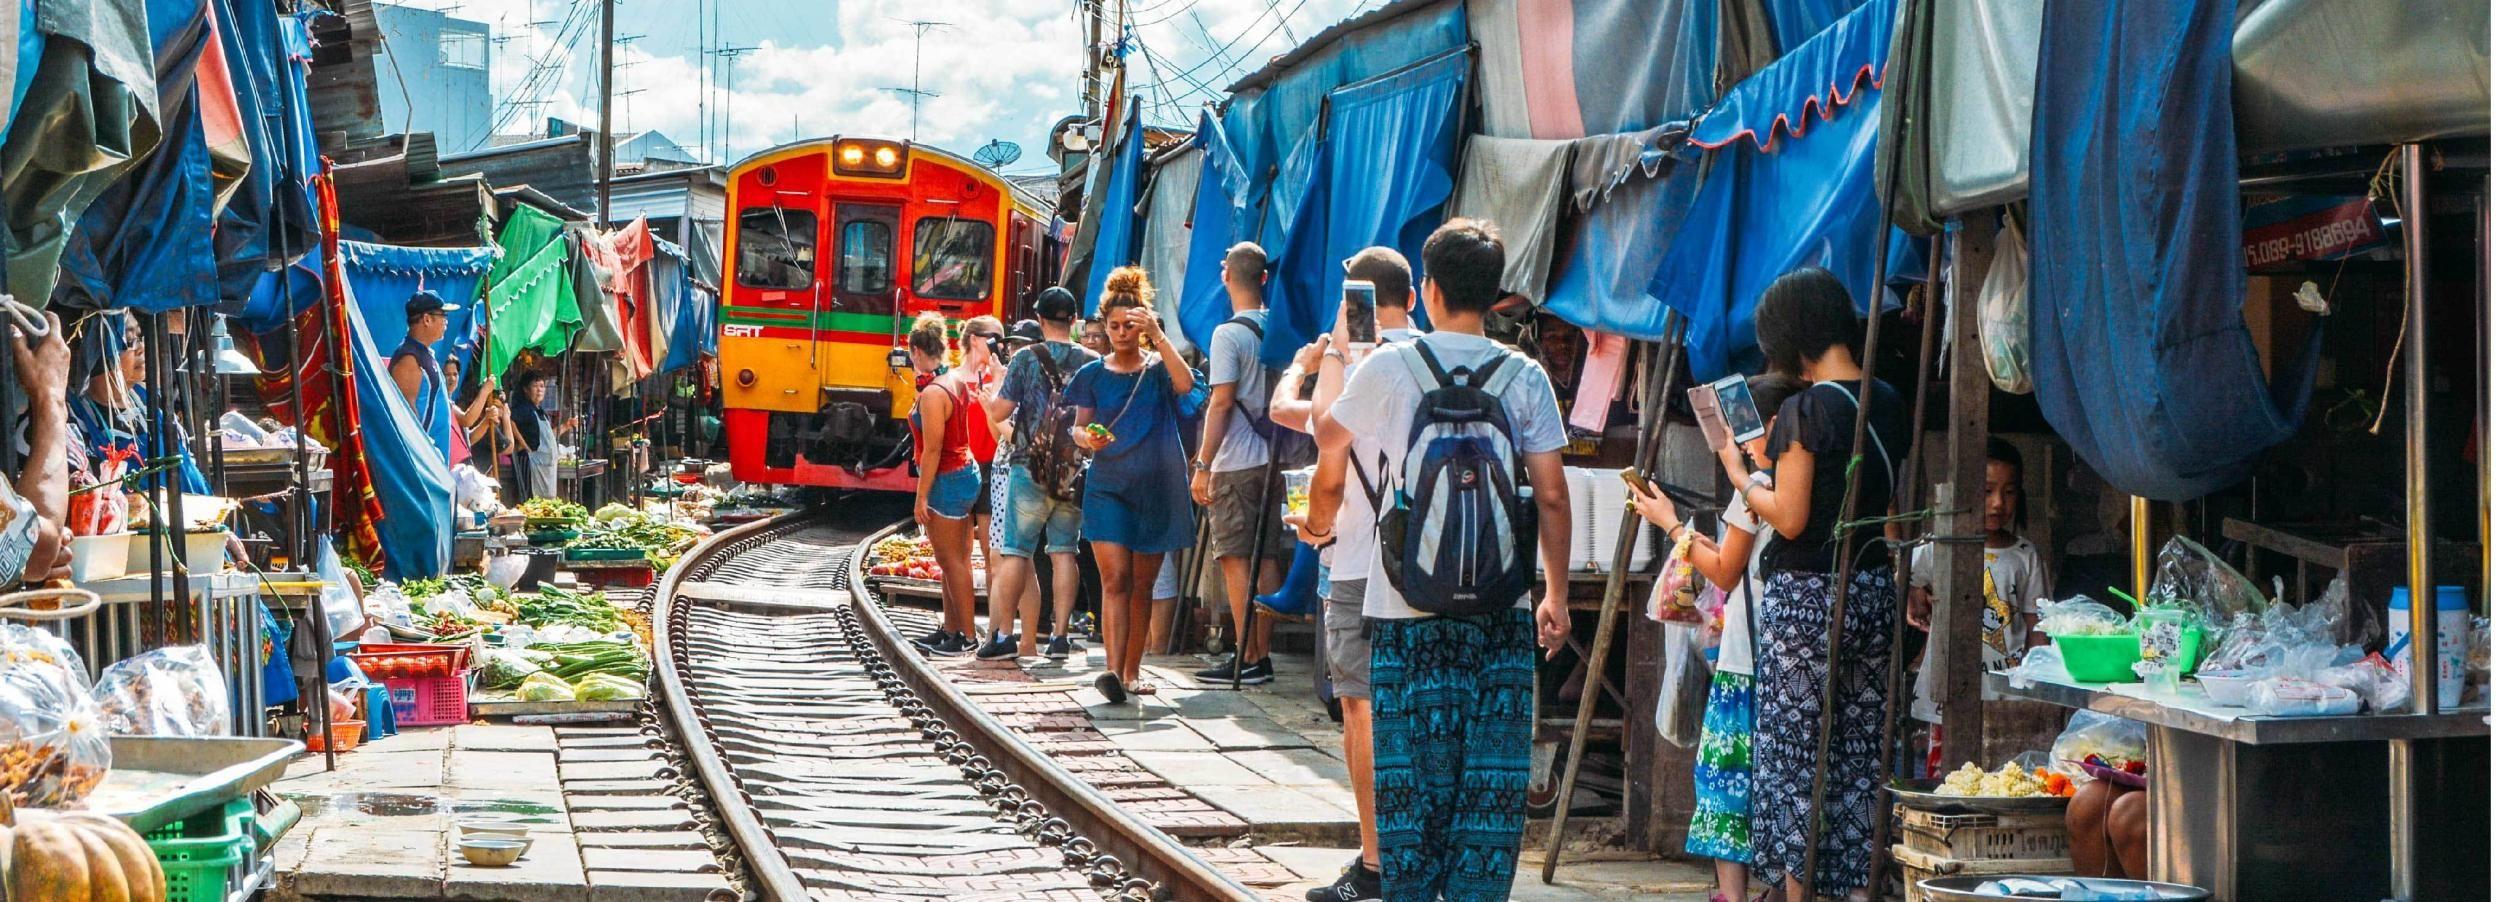 Desde Bangkok: Amphawa Floating Markets y Firefly Boat Tour